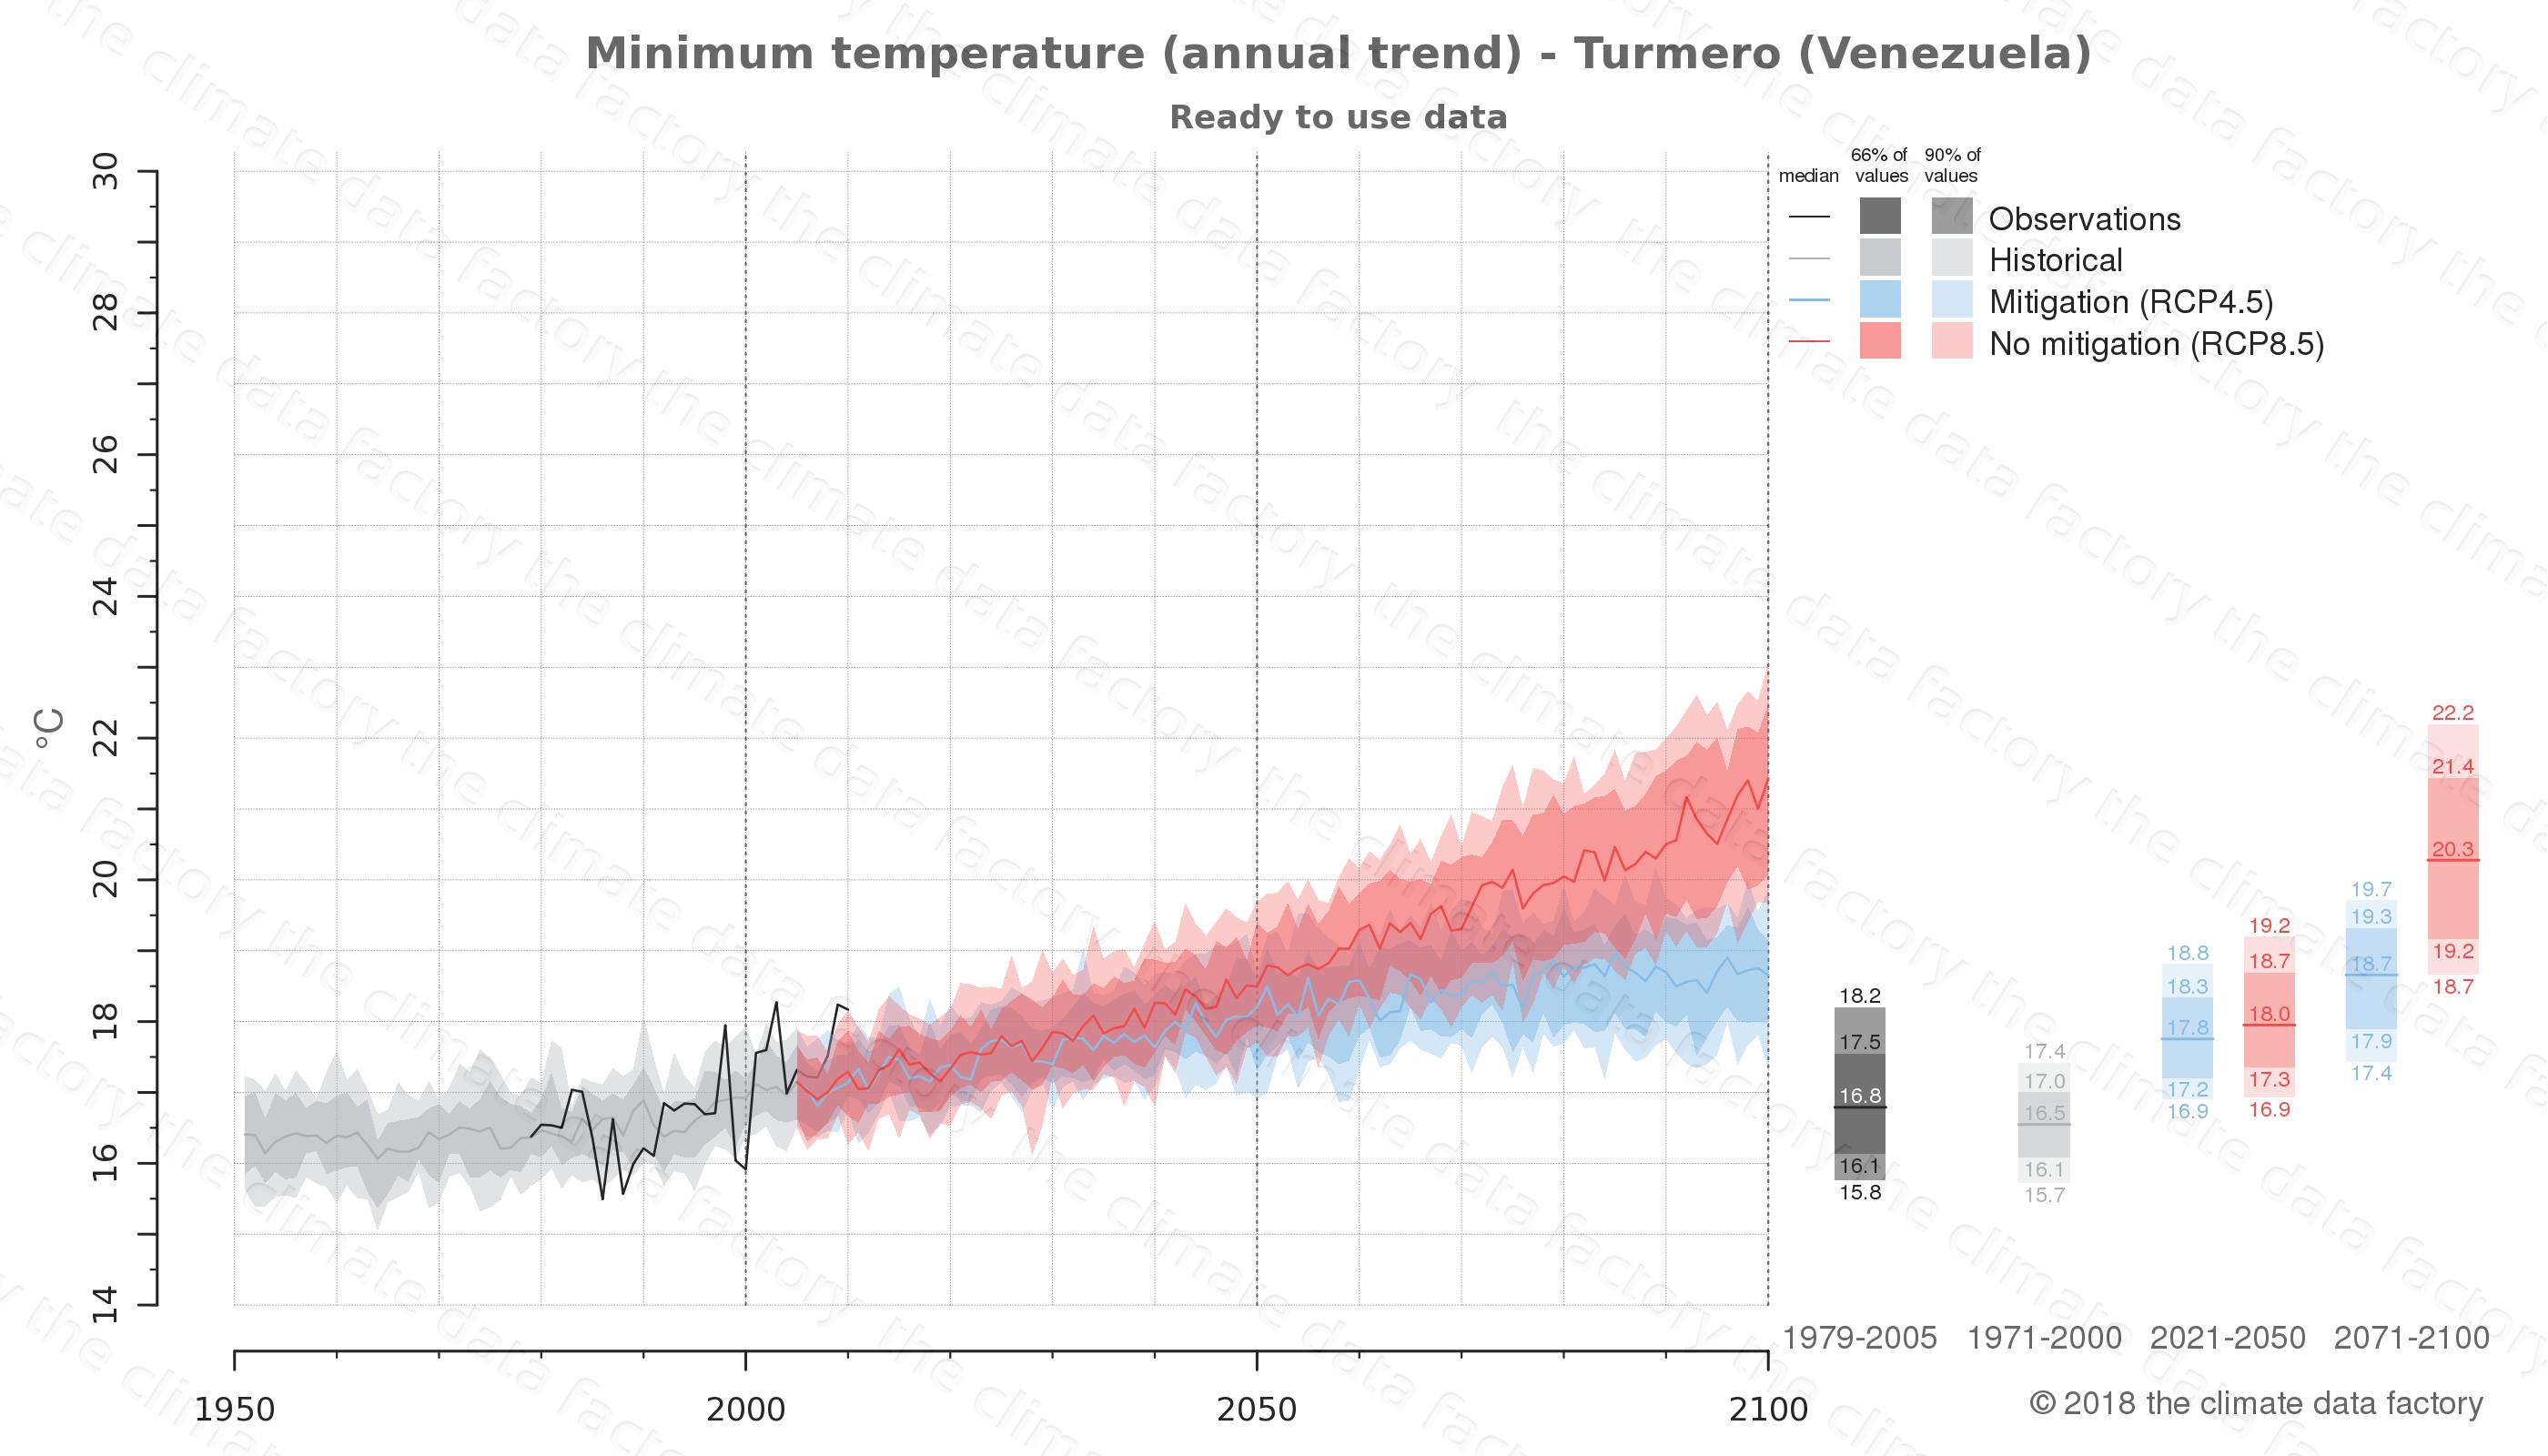 climate change data policy adaptation climate graph city data minimum-temperature turmero venezuela